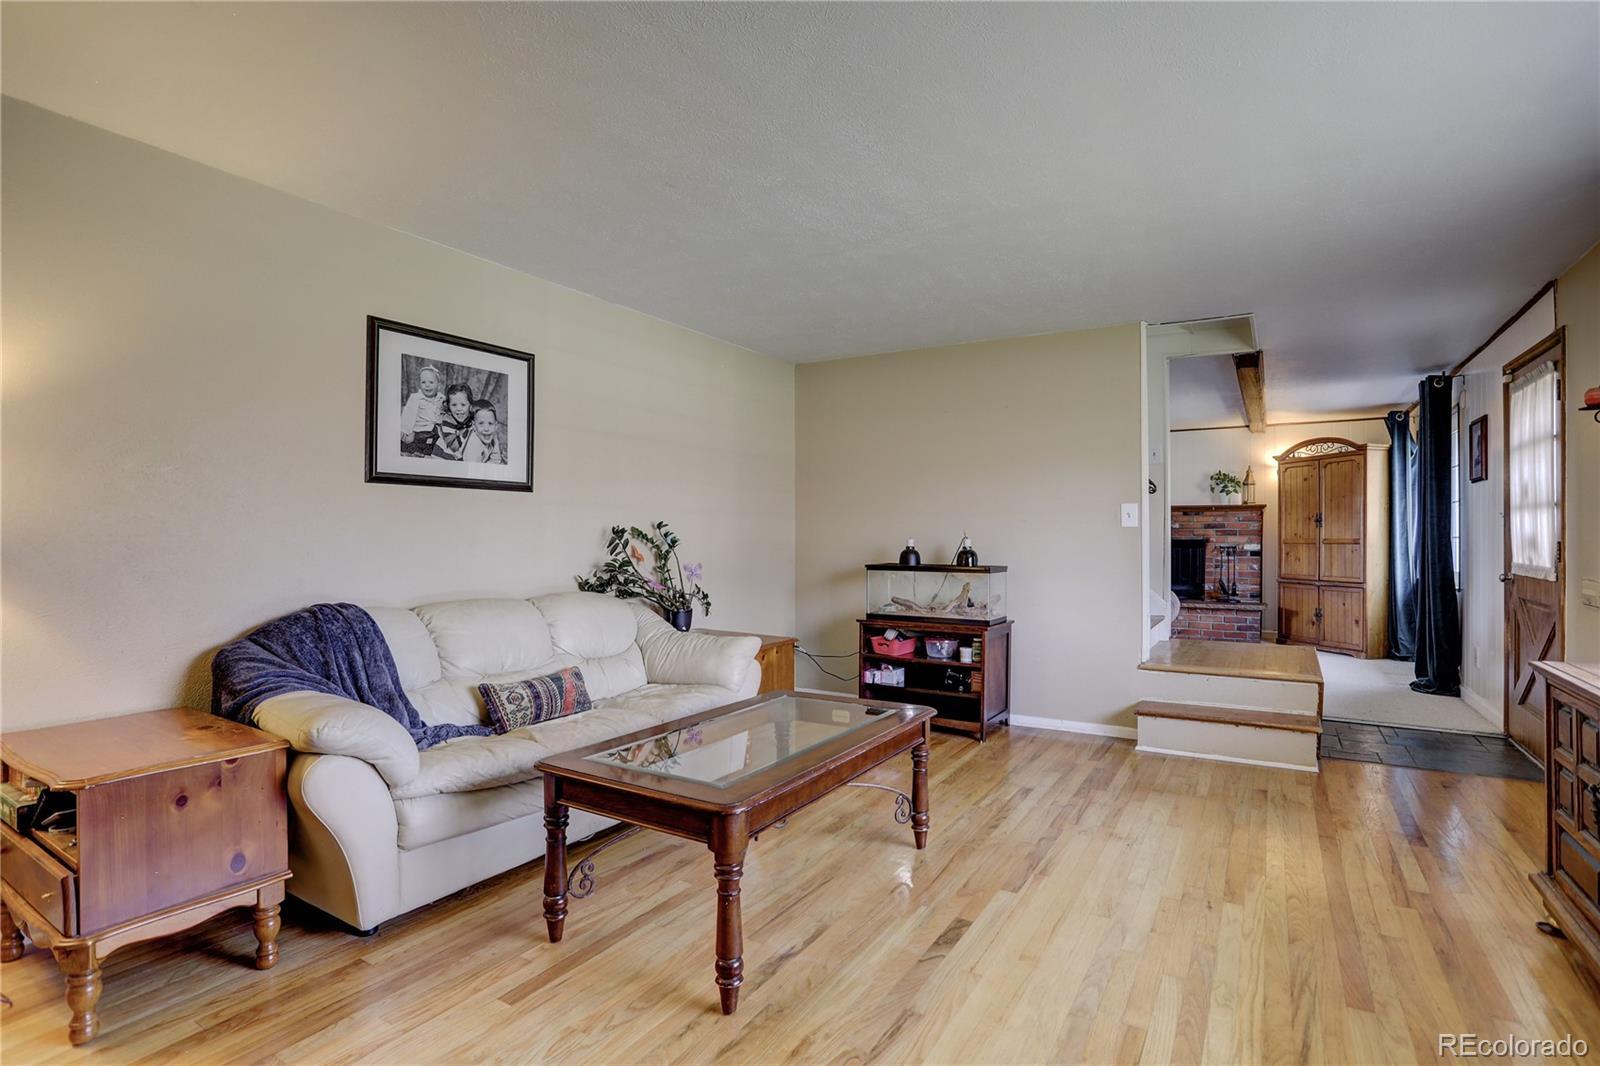 MLS# 1853069 - 7 - 820 W 6th Avenue, Broomfield, CO 80020